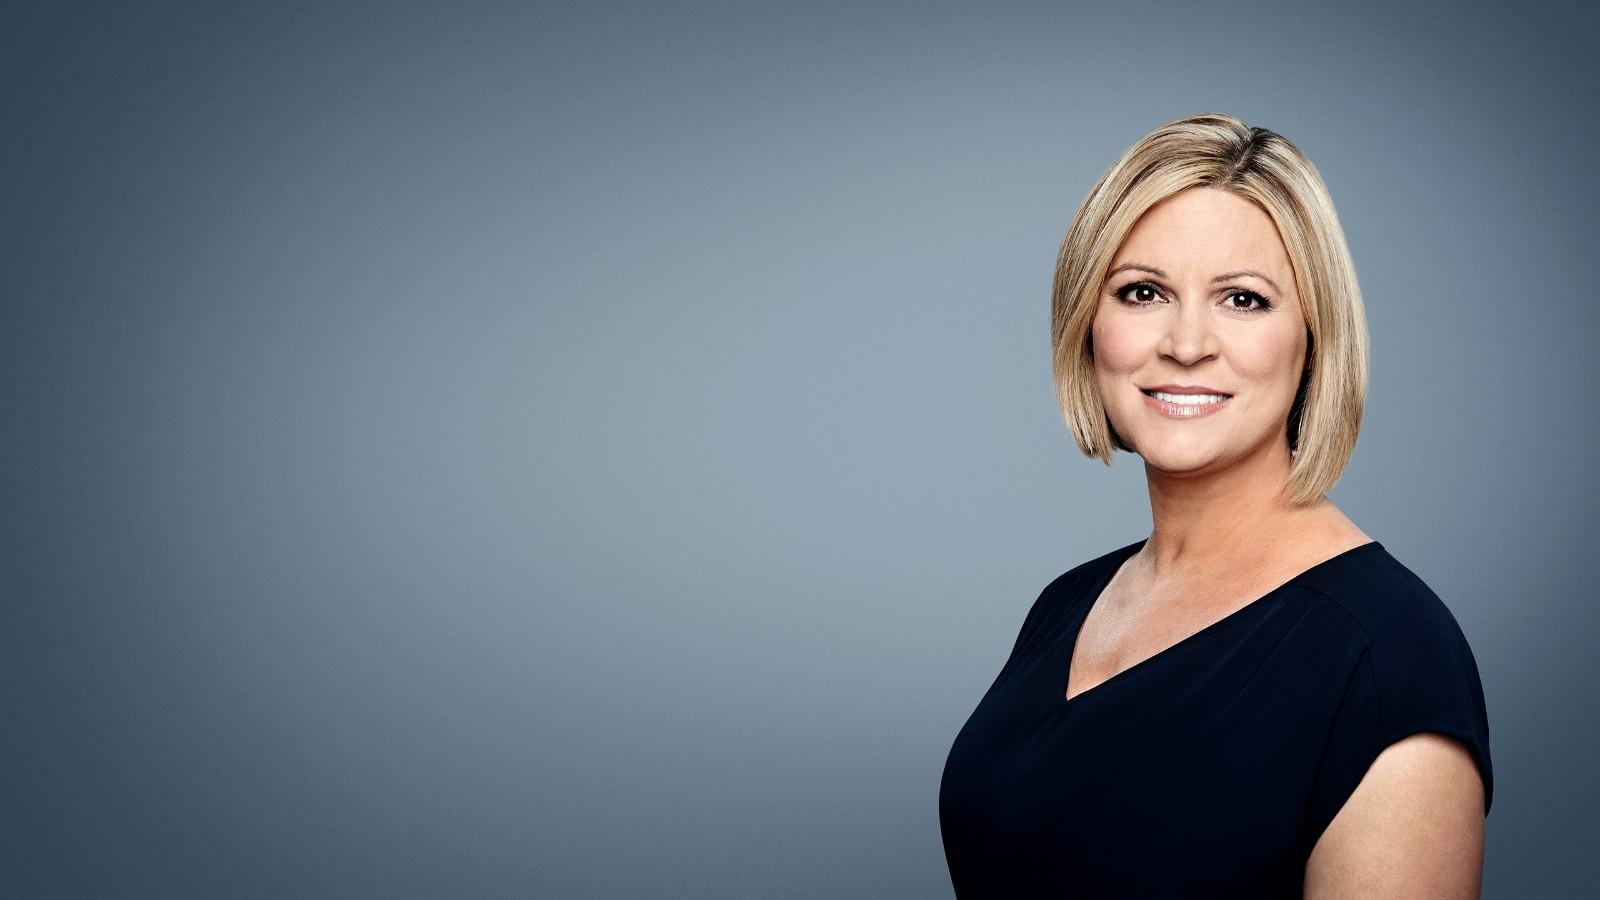 Cnn Profiles Jennifer Westhoven Cnn Com